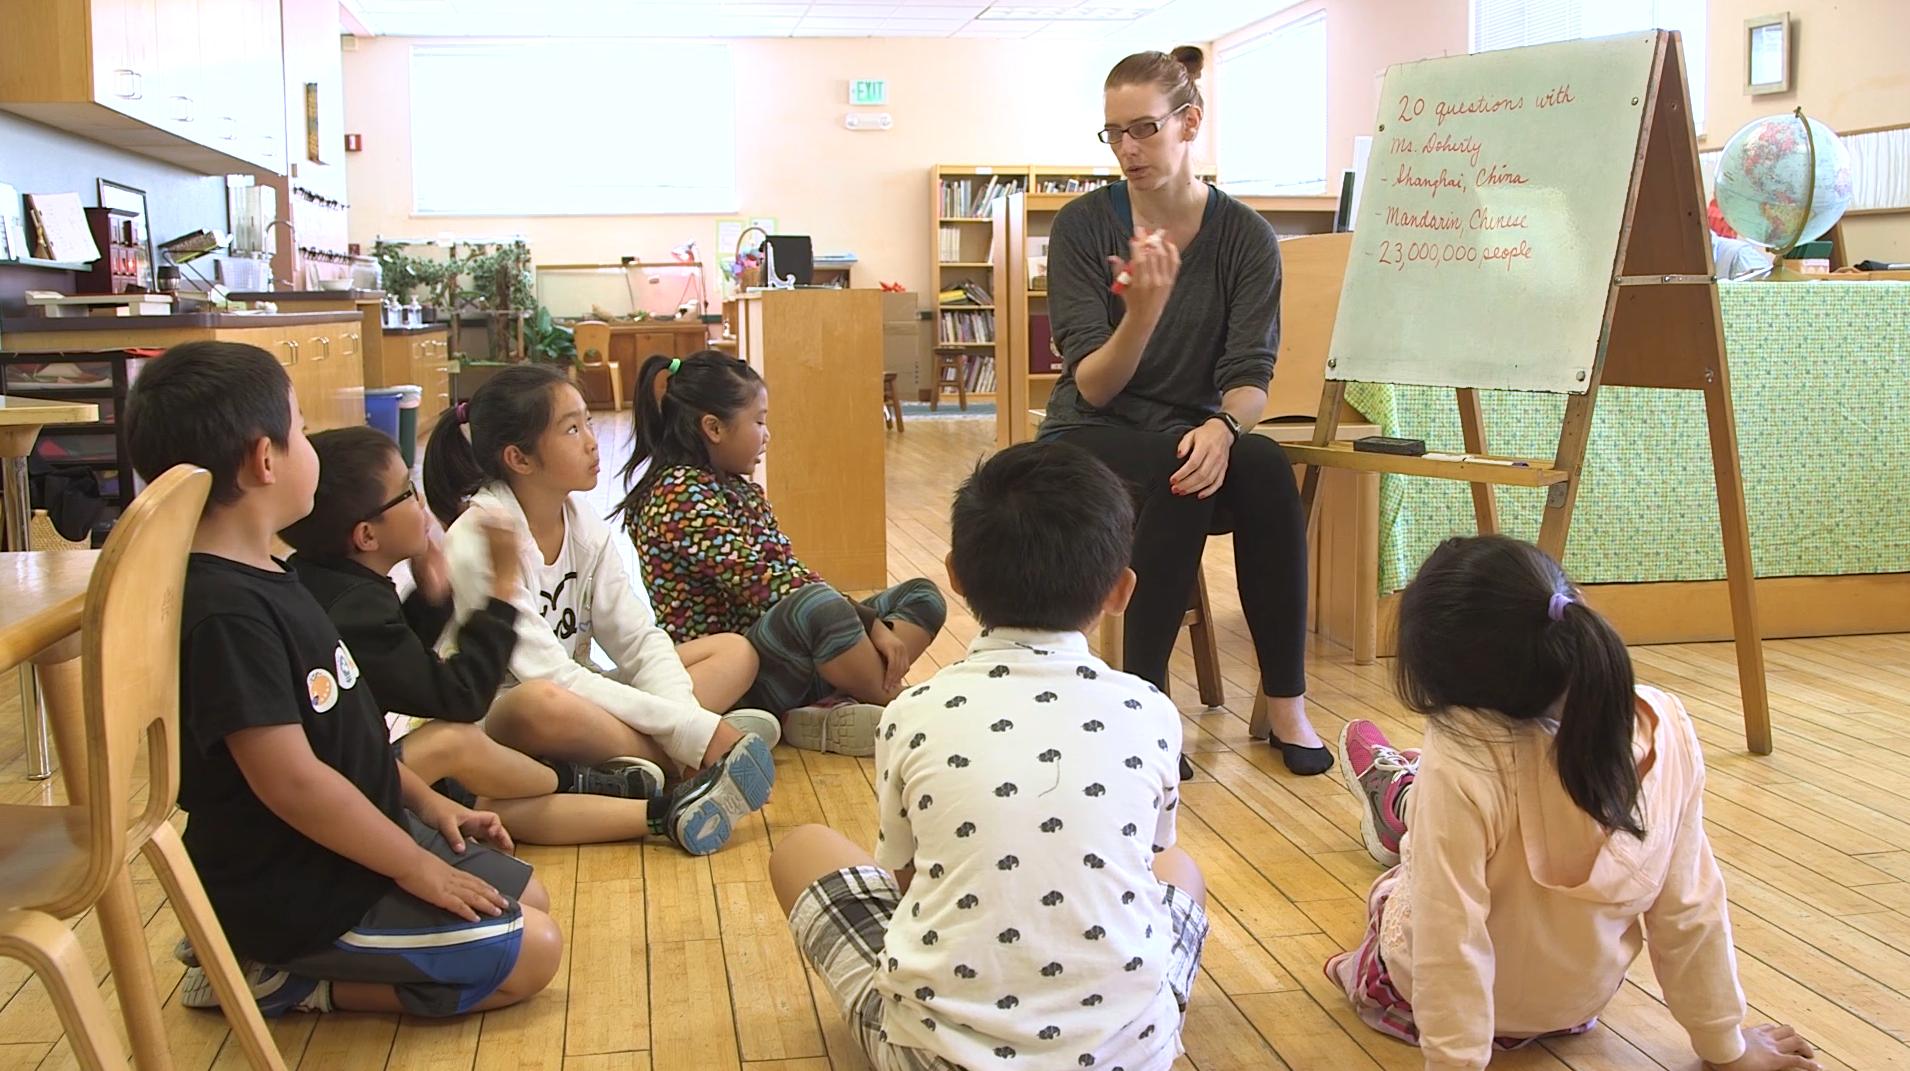 Students gathered around a teacher